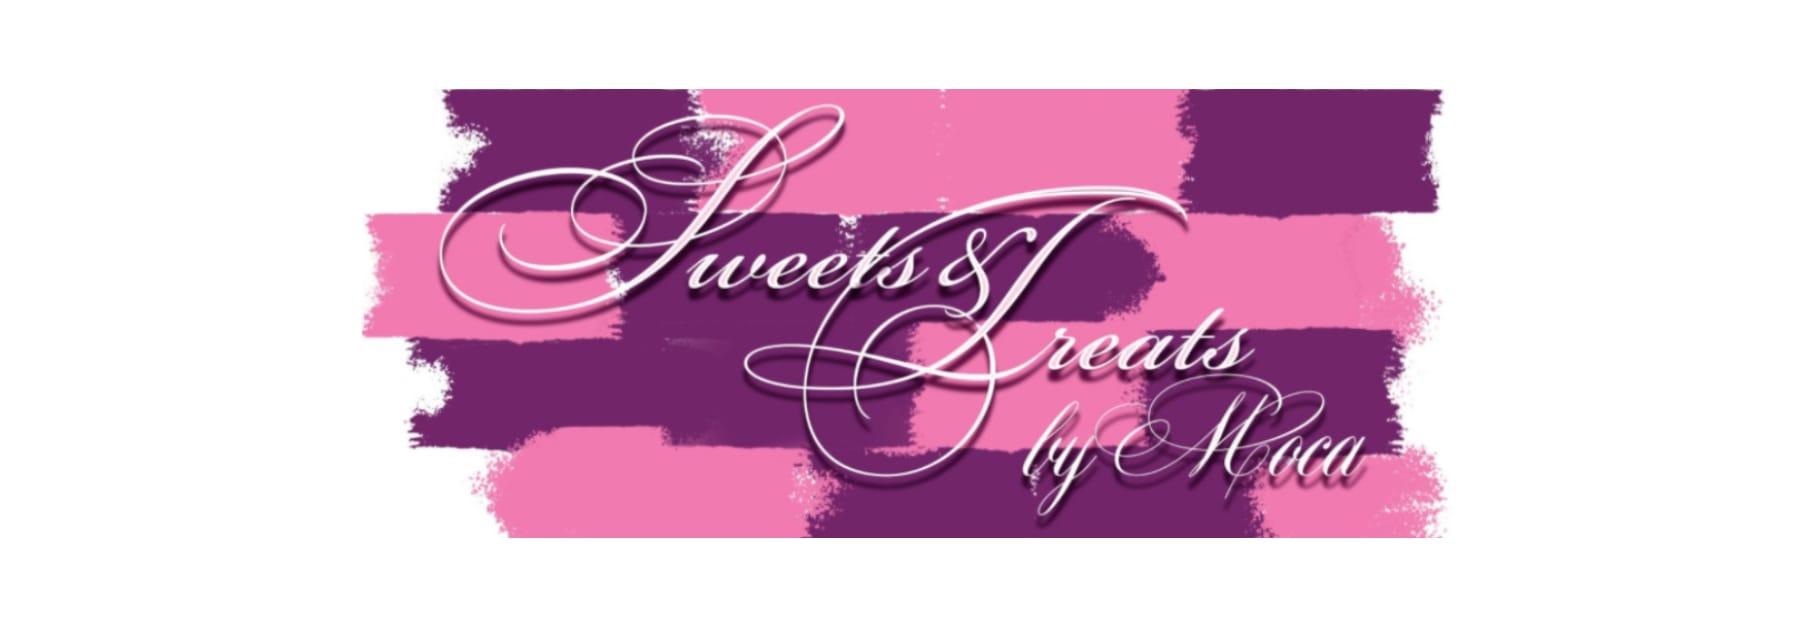 Sweets & Treats by Moca